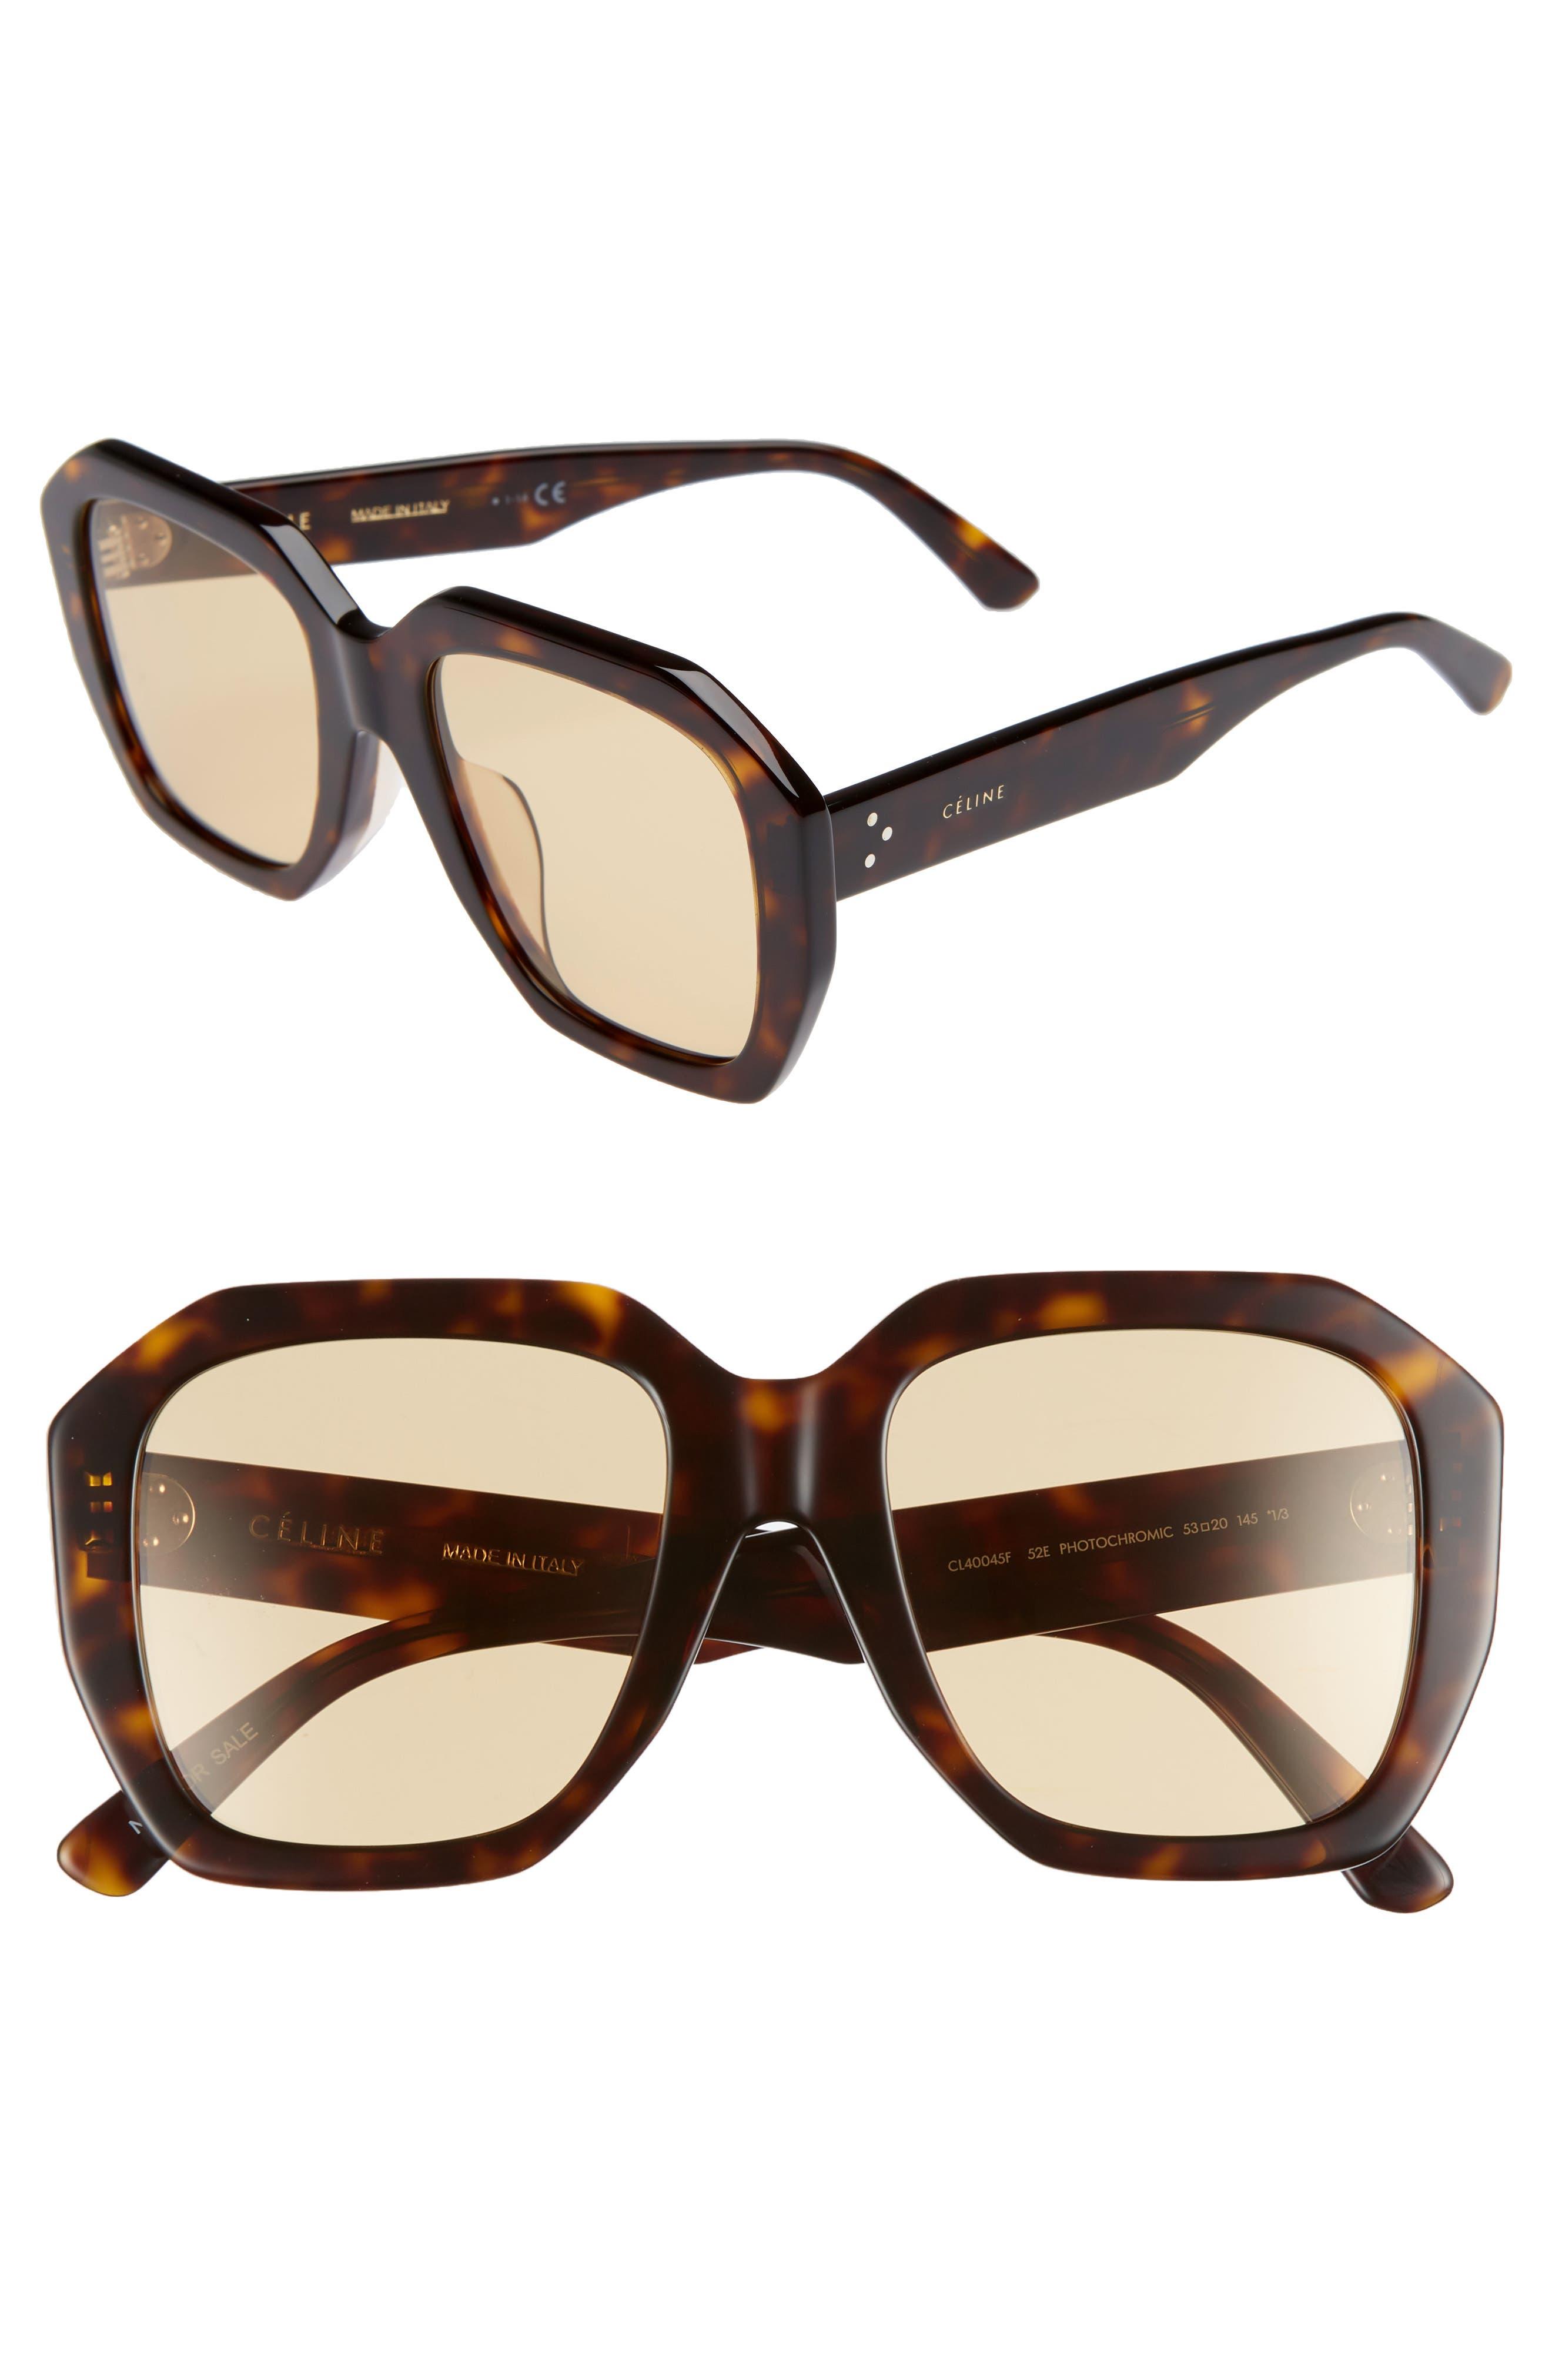 Nordstrom: Sunglasses Starting at $25